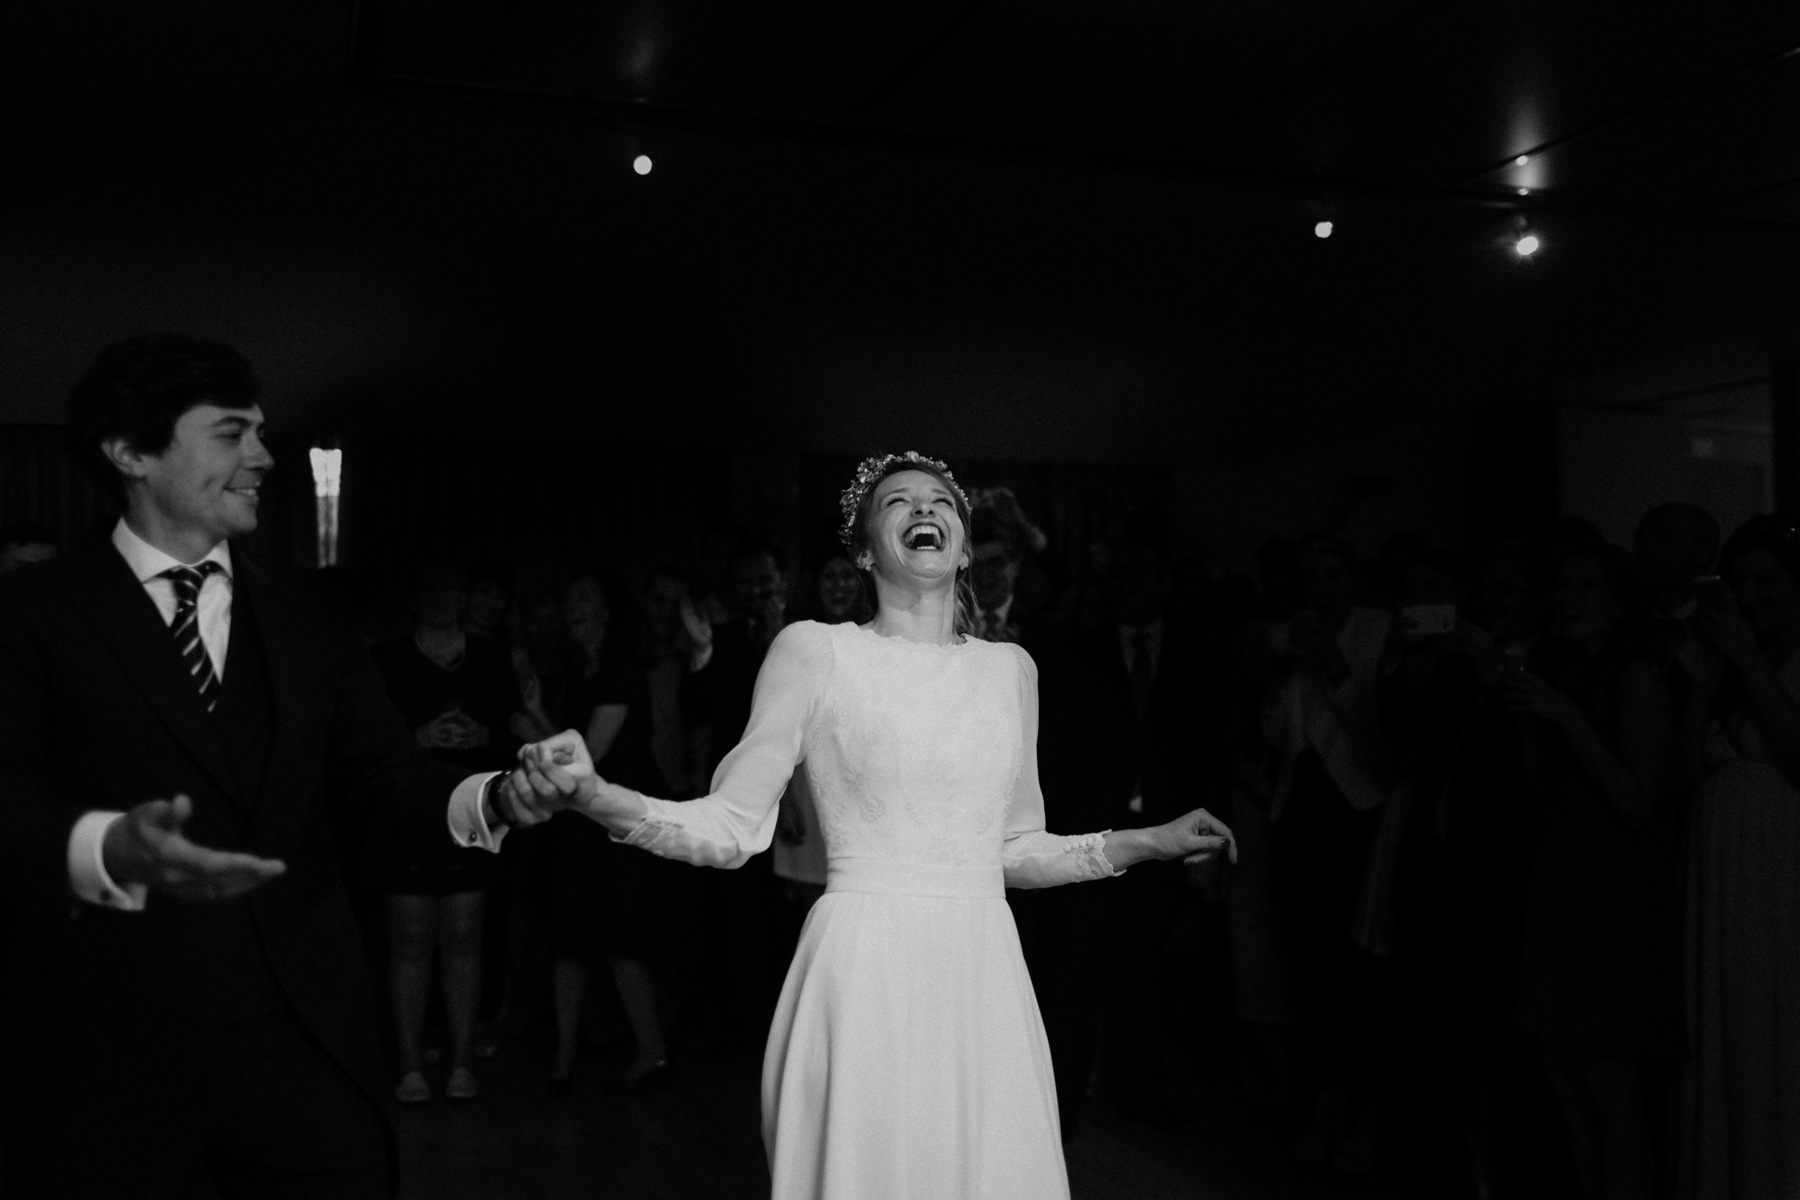 fotografo de bodas Jairo Crena-133